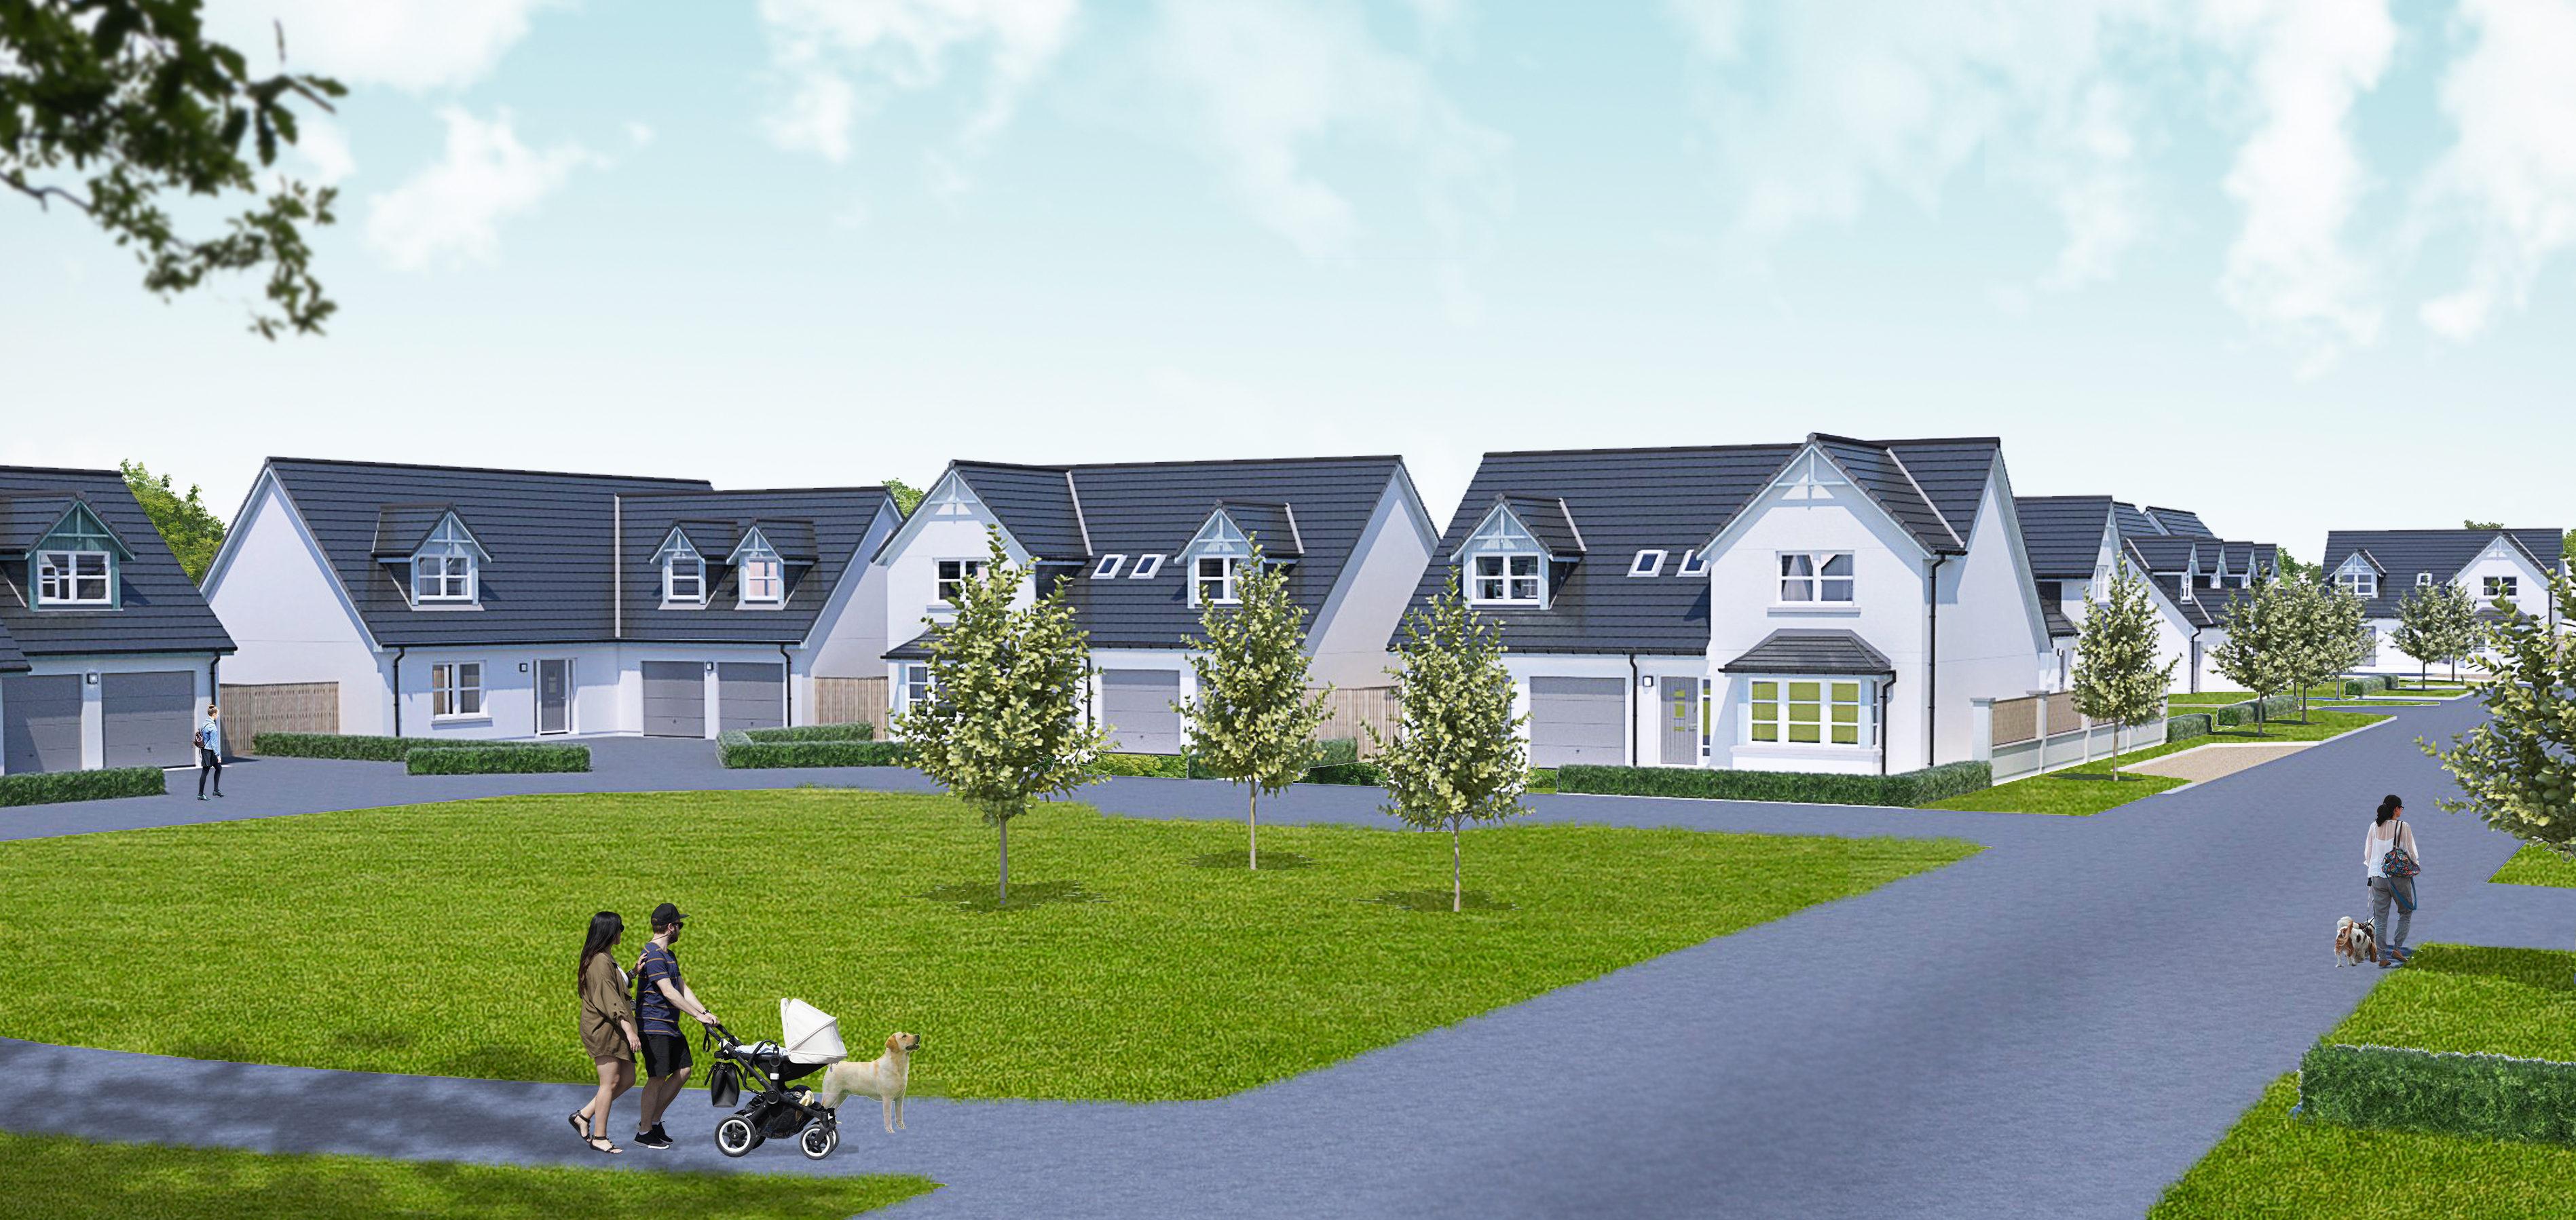 The Balgillo Heights development.